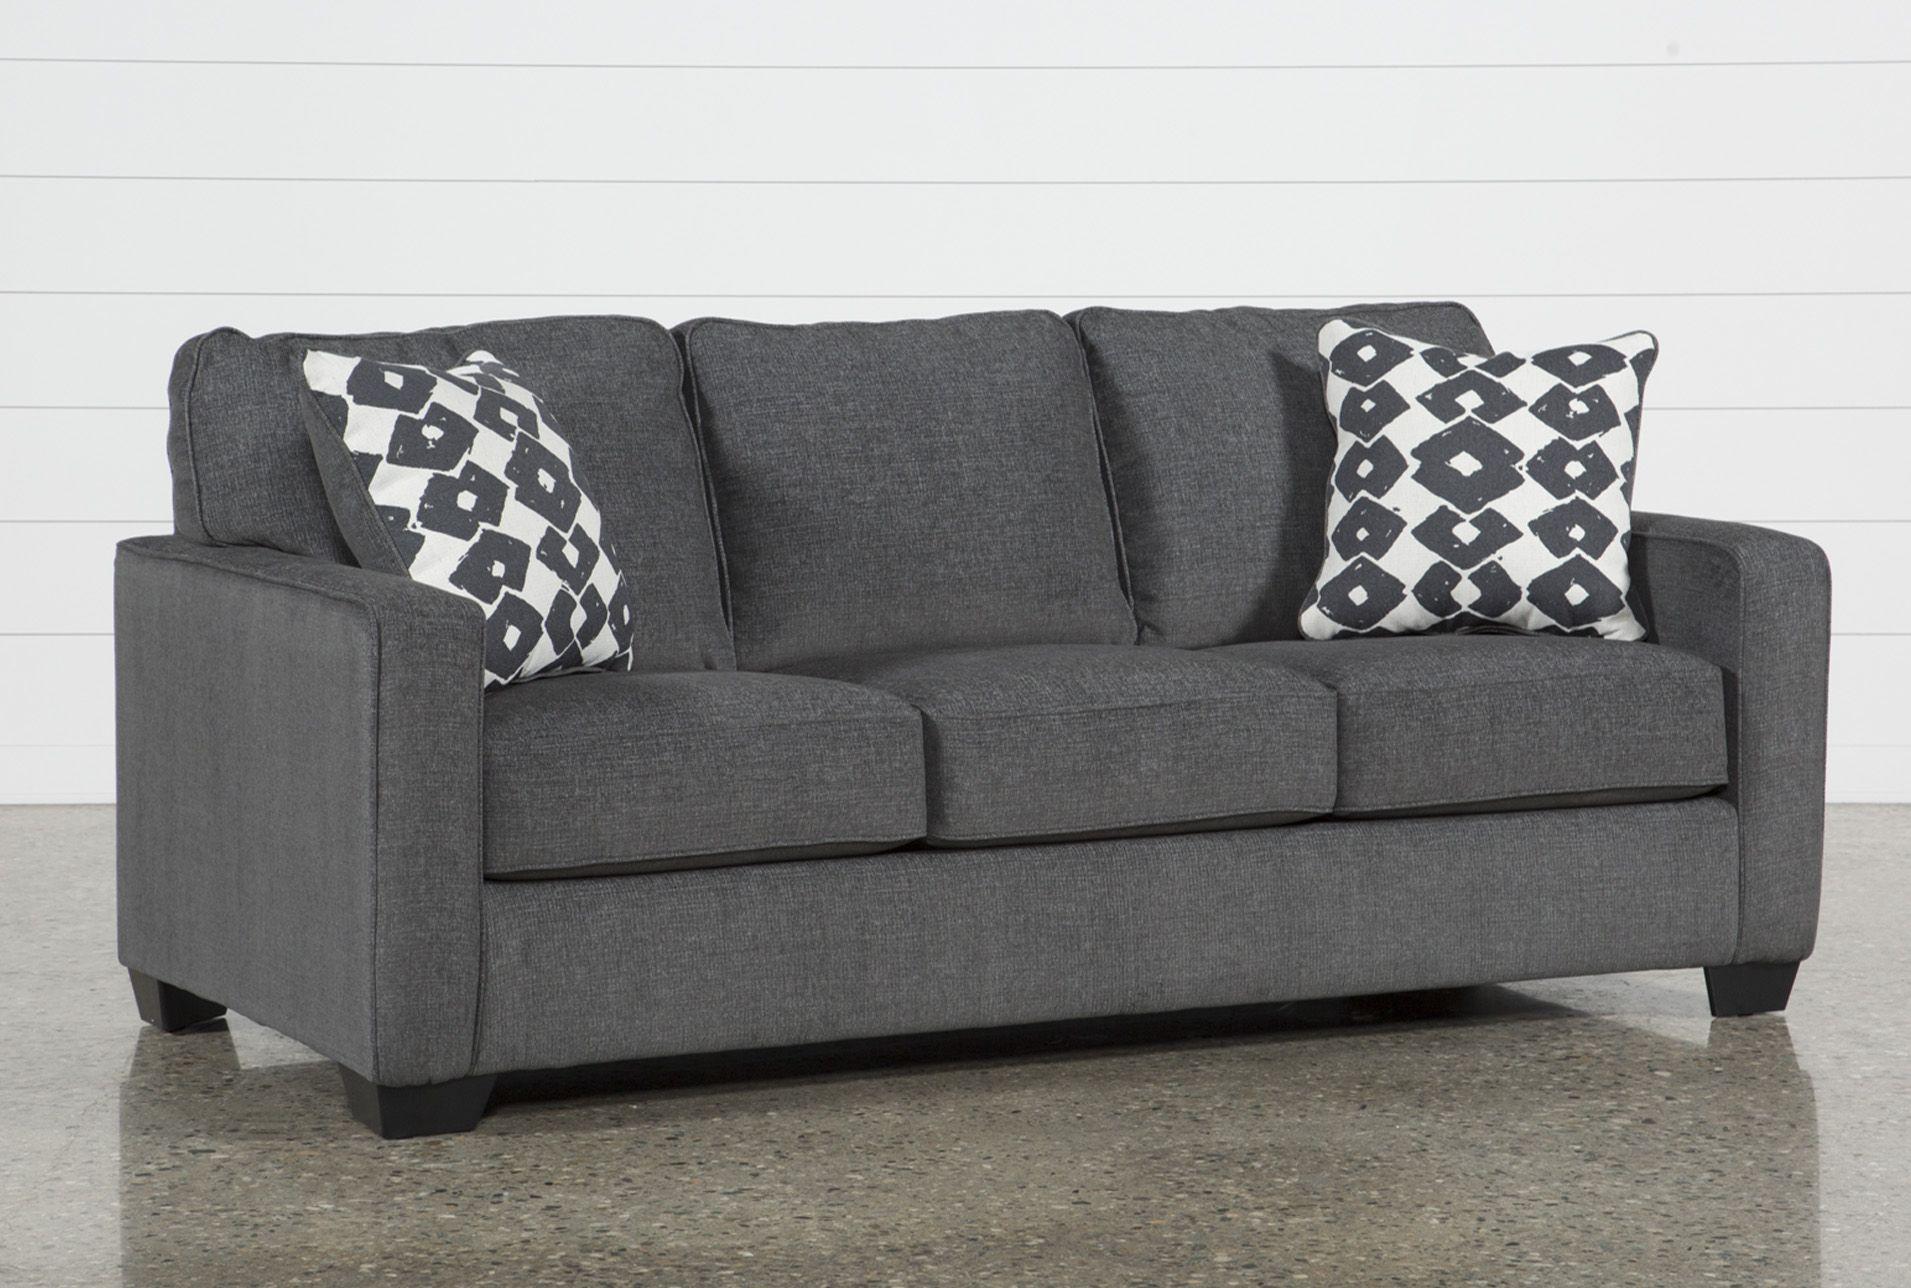 Value Of A Small Sofa Bed Small Sofa Bed Living Room Sofa Living Room Sofa Set